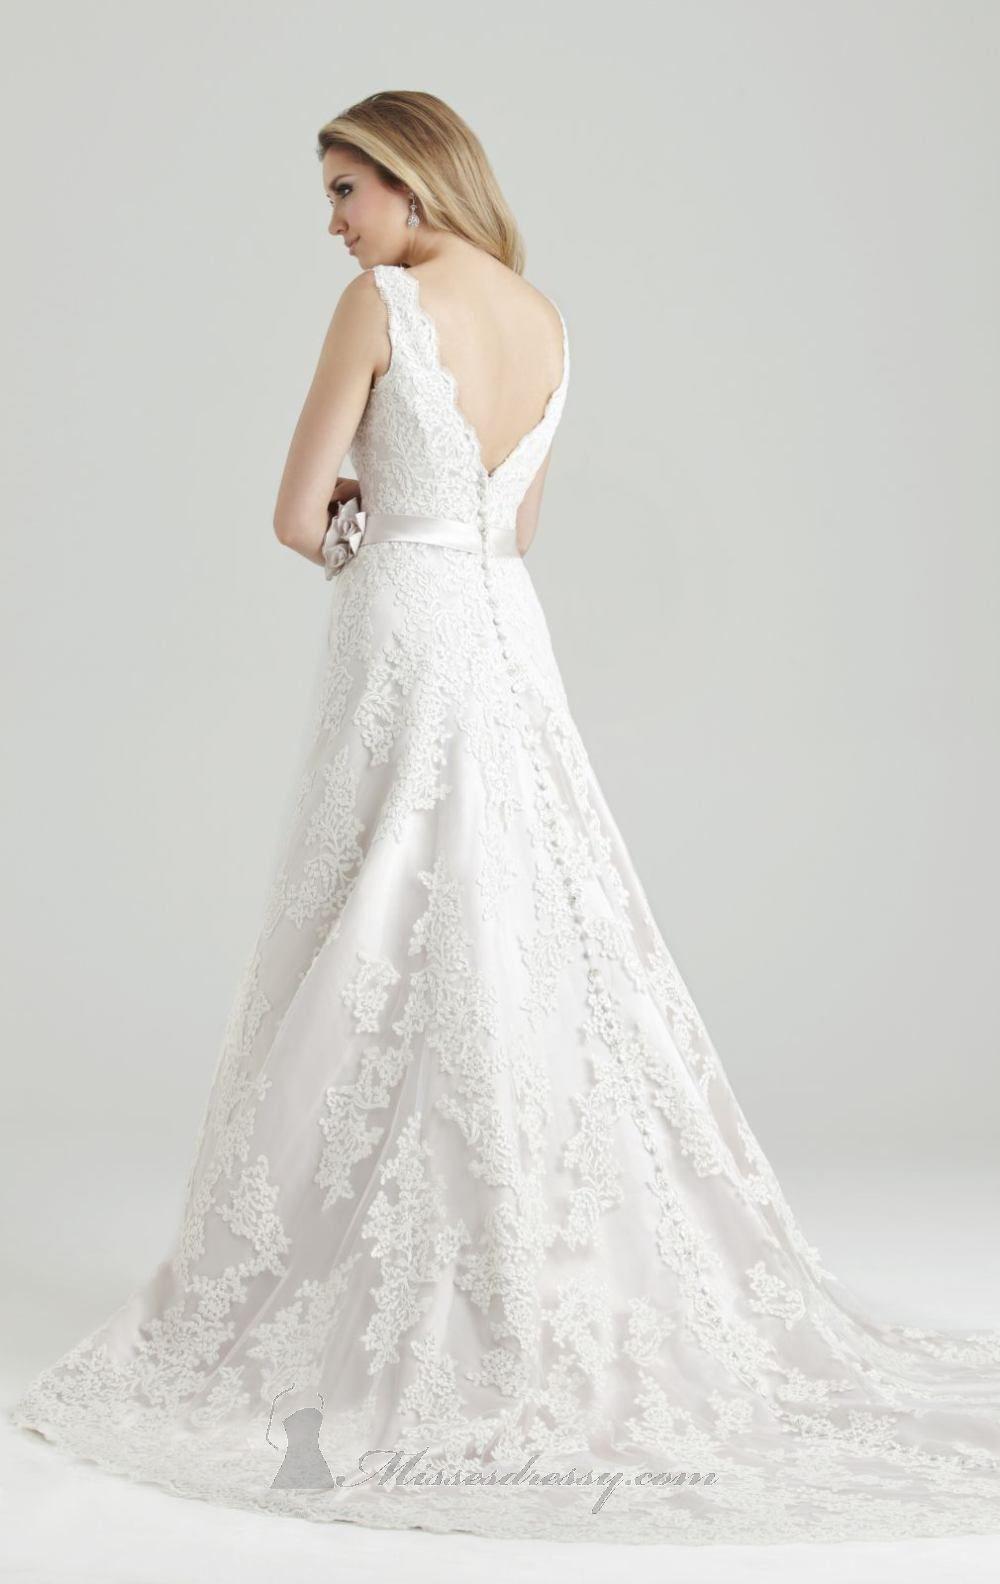 Allure p dress missesdressy bridal fashion pinterest